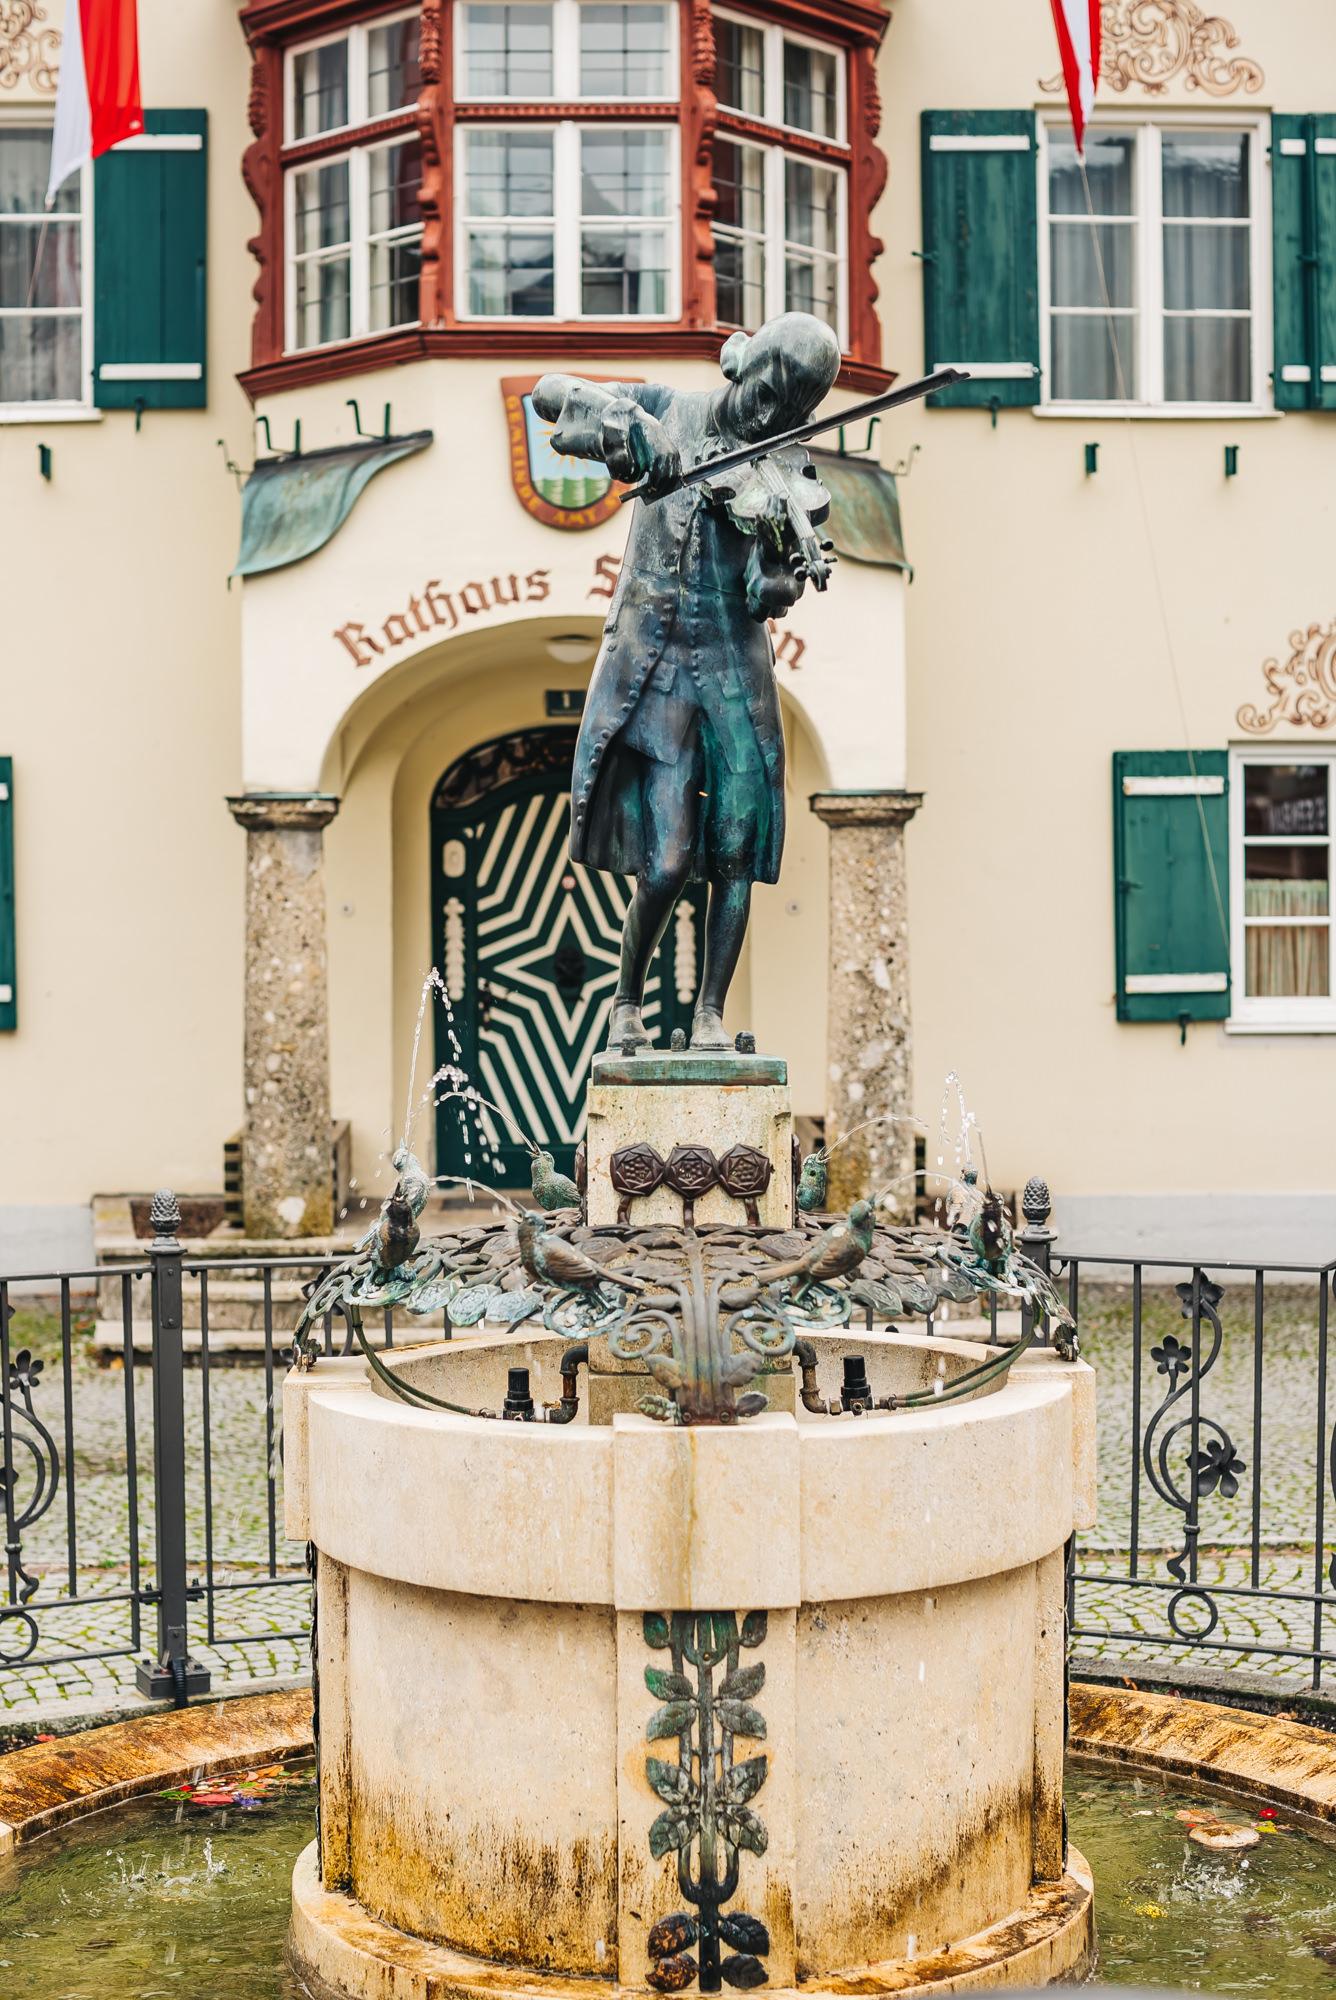 Mozart's Statue at Wolfgang Lake Village